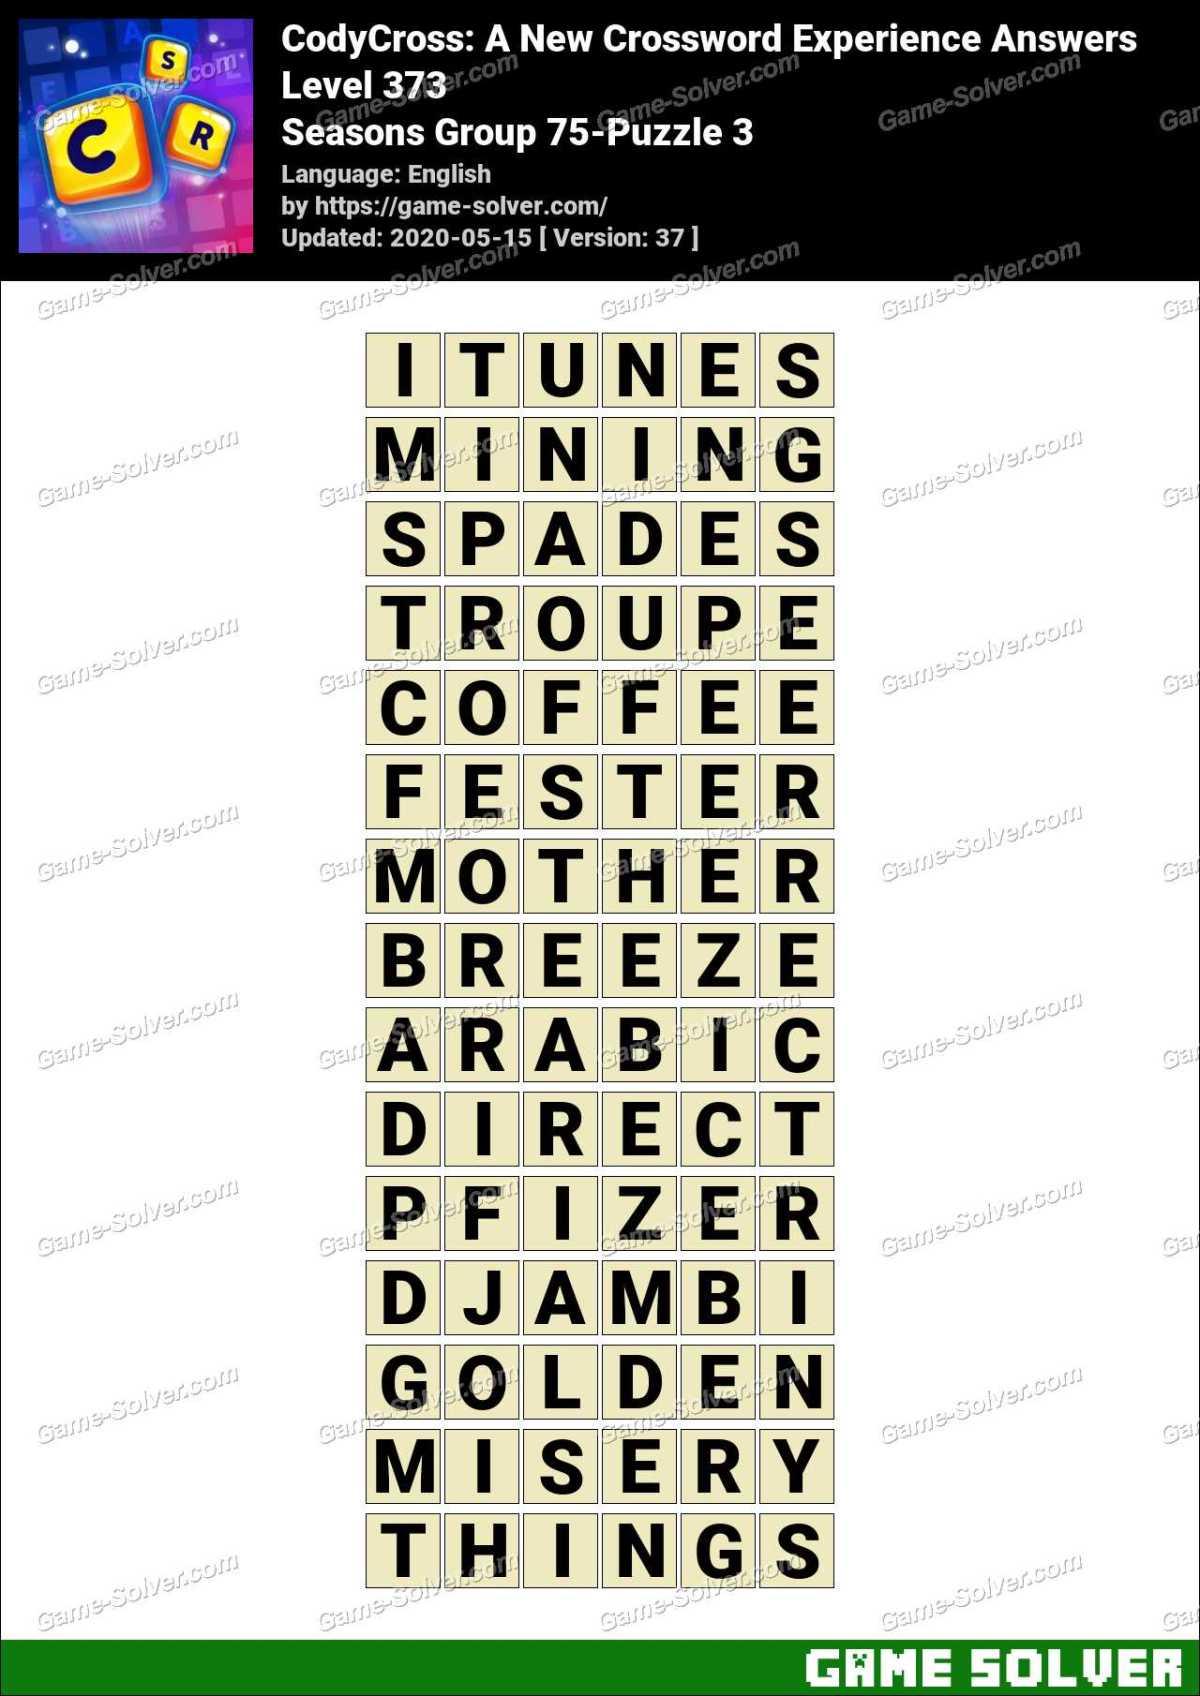 CodyCross Seasons Group 75-Puzzle 3 Answers